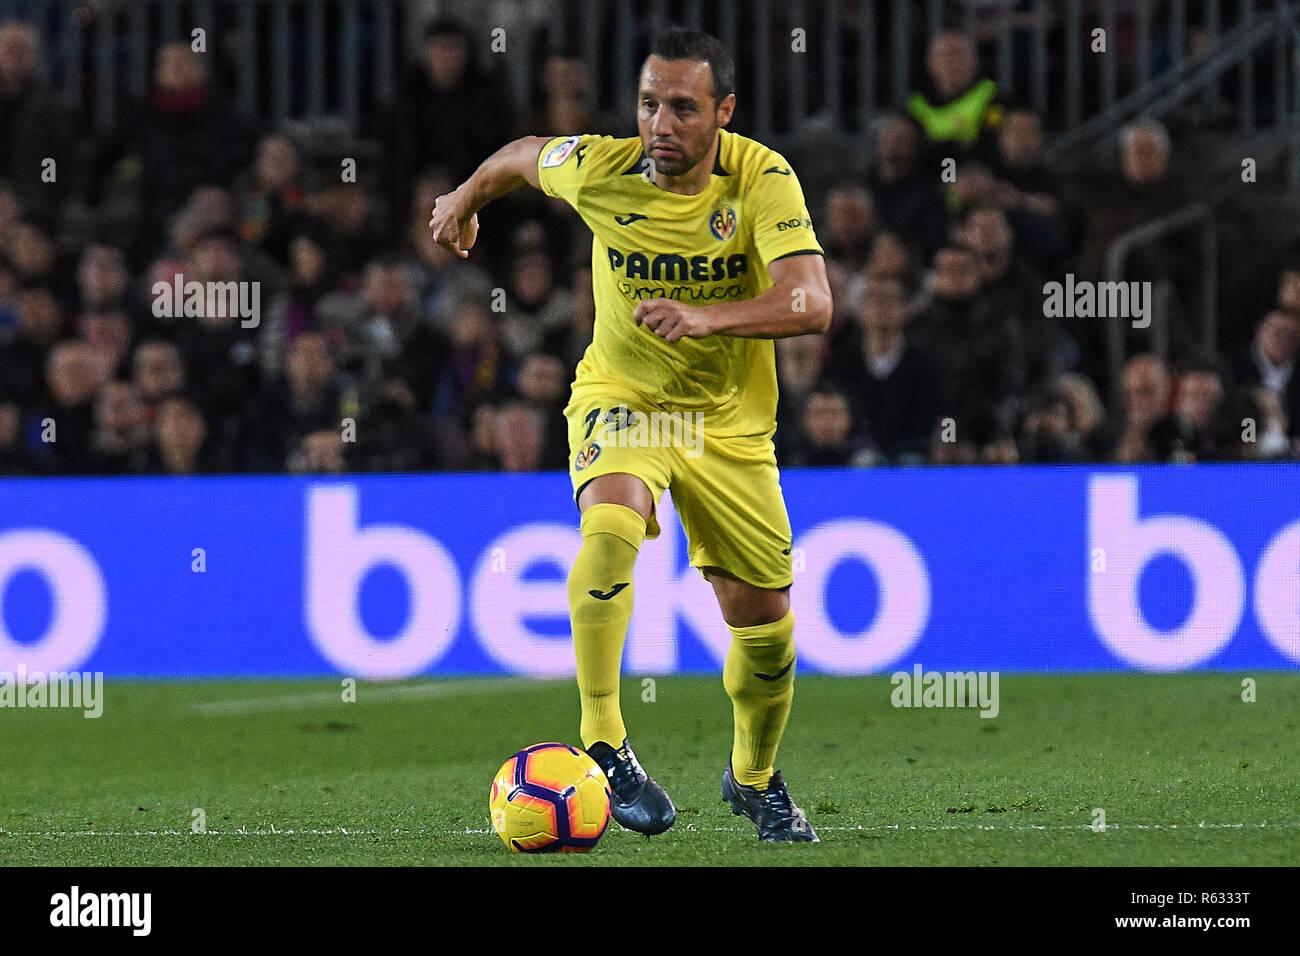 Image result for Santi Cazorla against barcelona